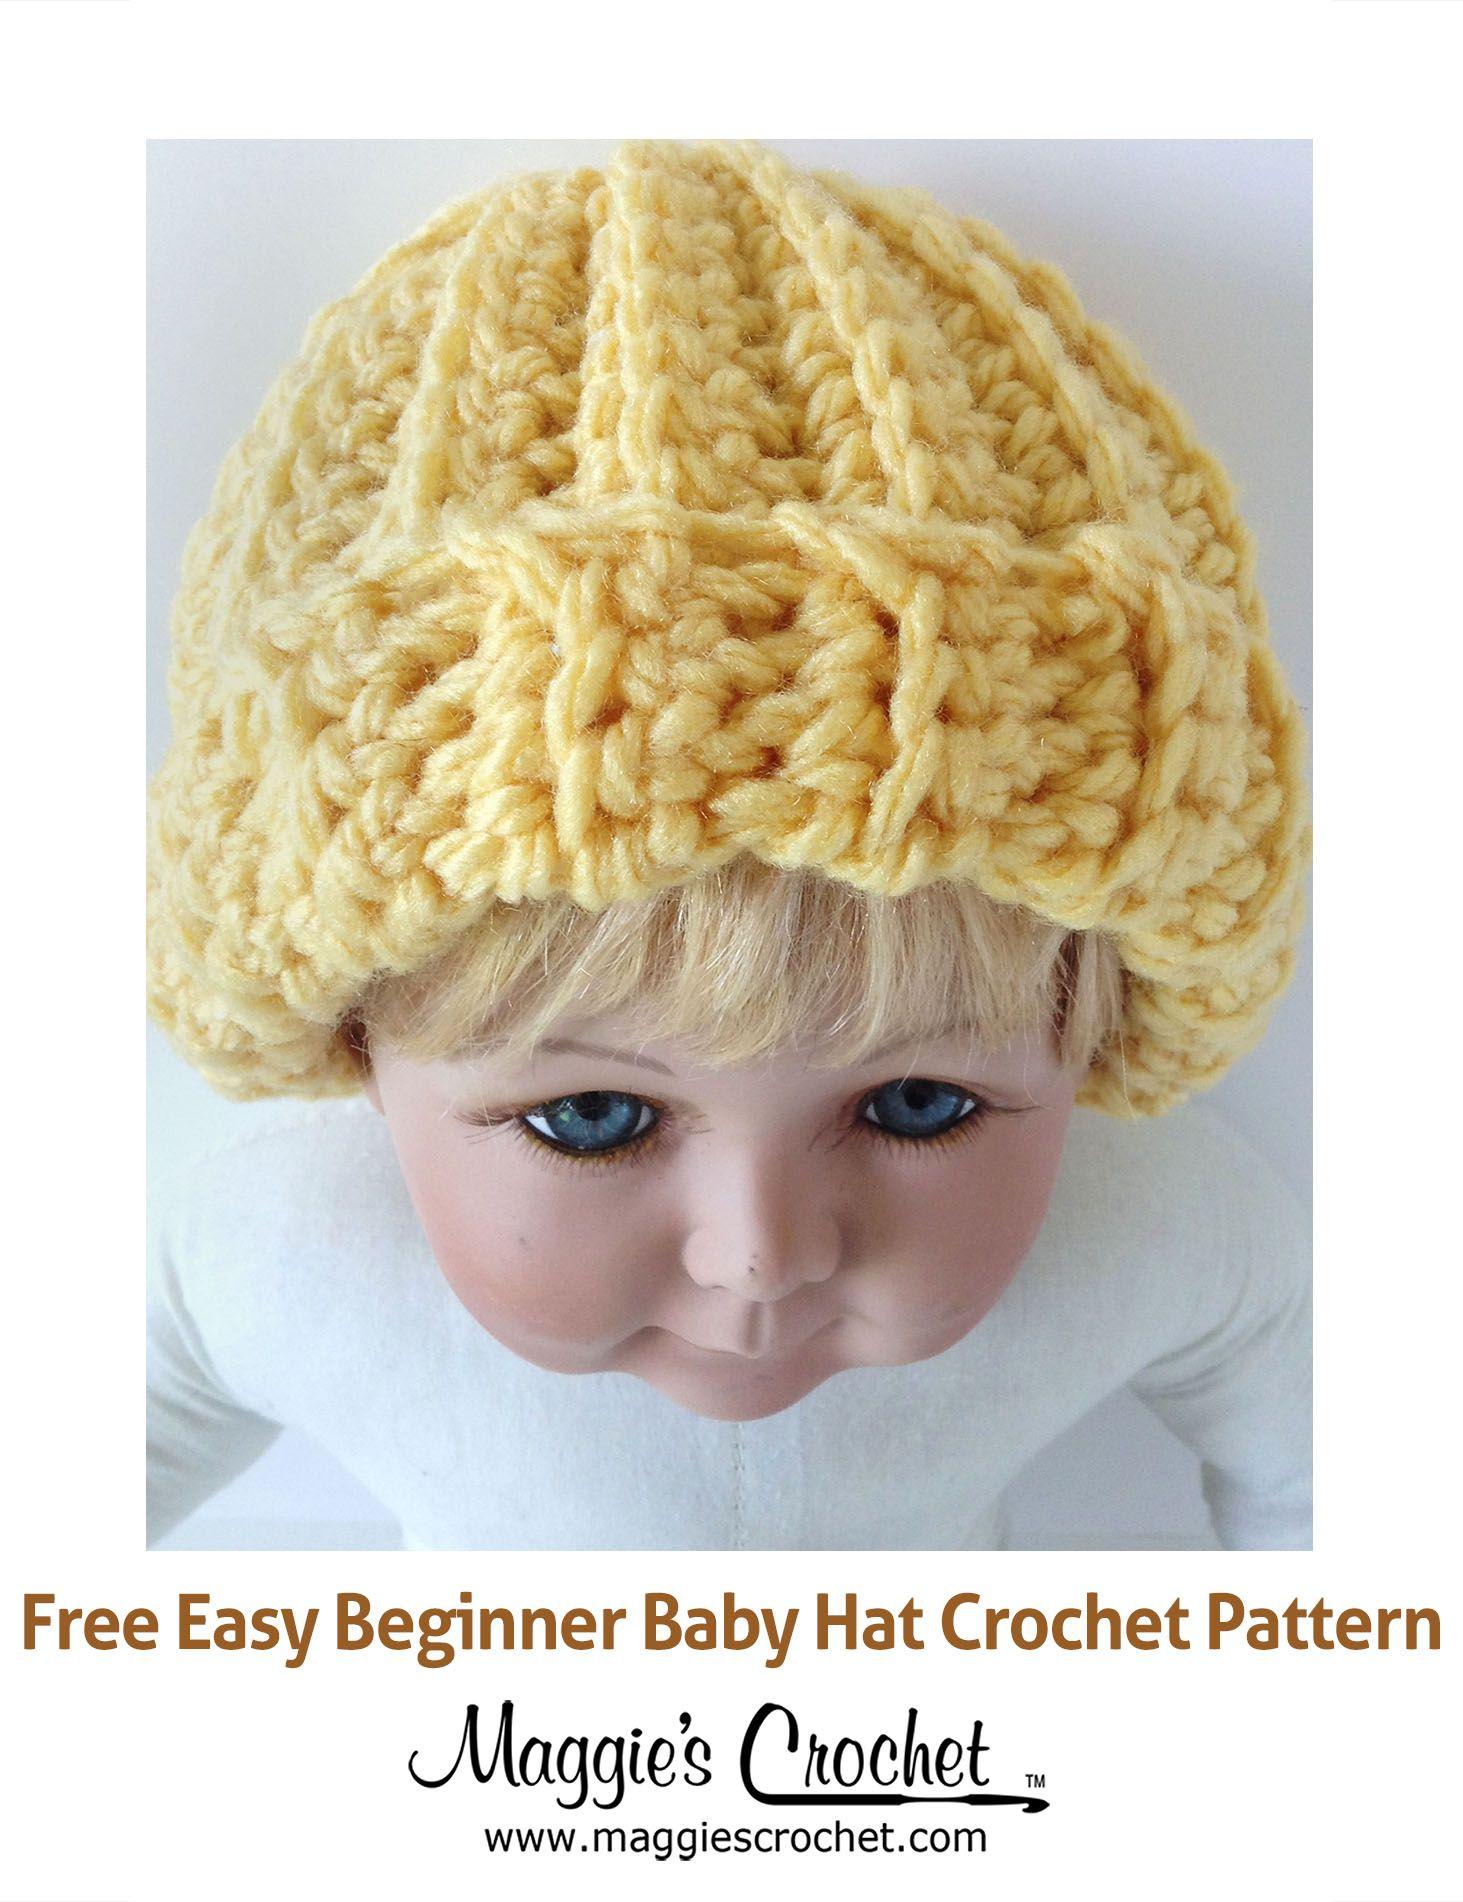 Easy beginner baby hat free crochet pattern from maggies crochet easy beginner baby hat free crochet pattern from maggies crochet bankloansurffo Gallery